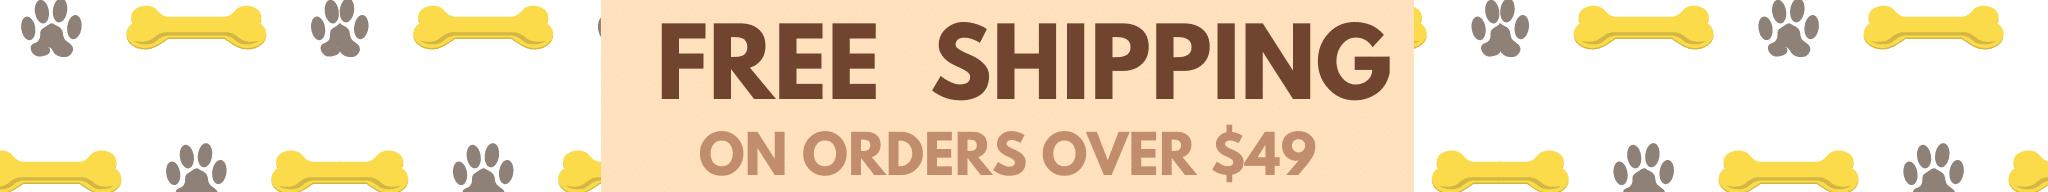 CEN DOG Nutrition FREE SHIPPING (3)